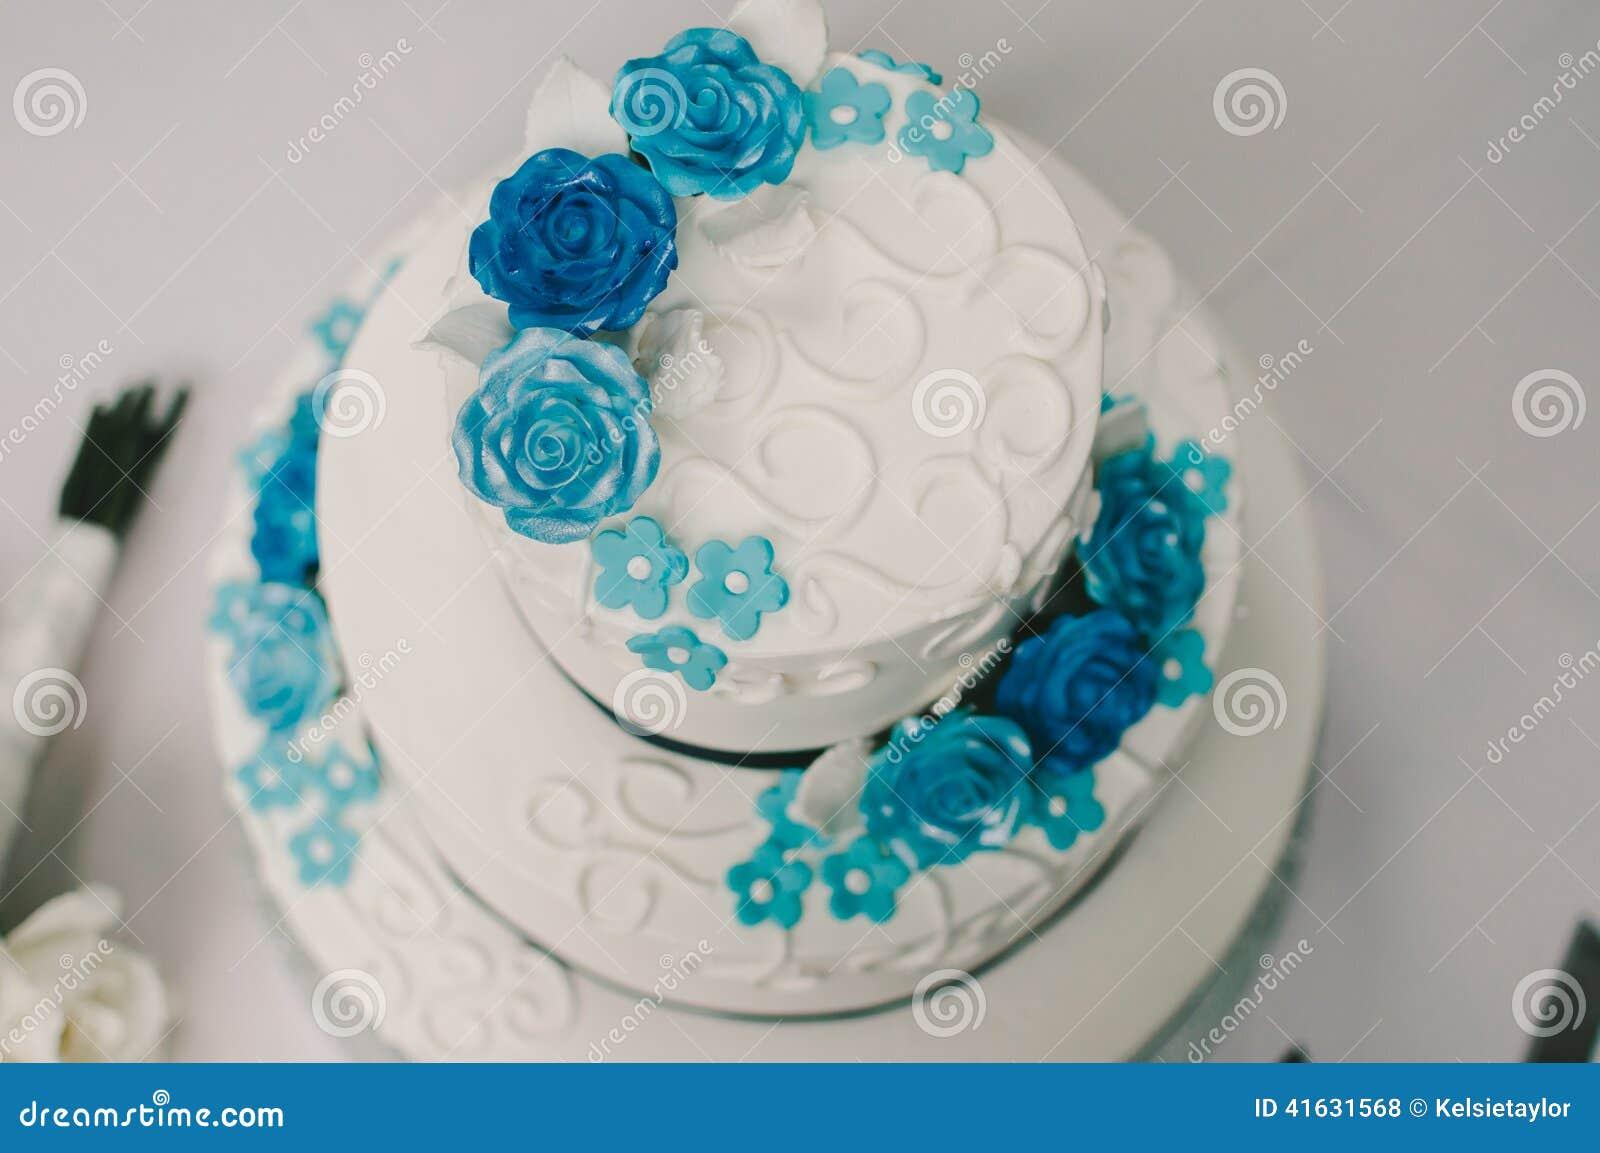 Blue And White Flower Wedding Cake Stock Image